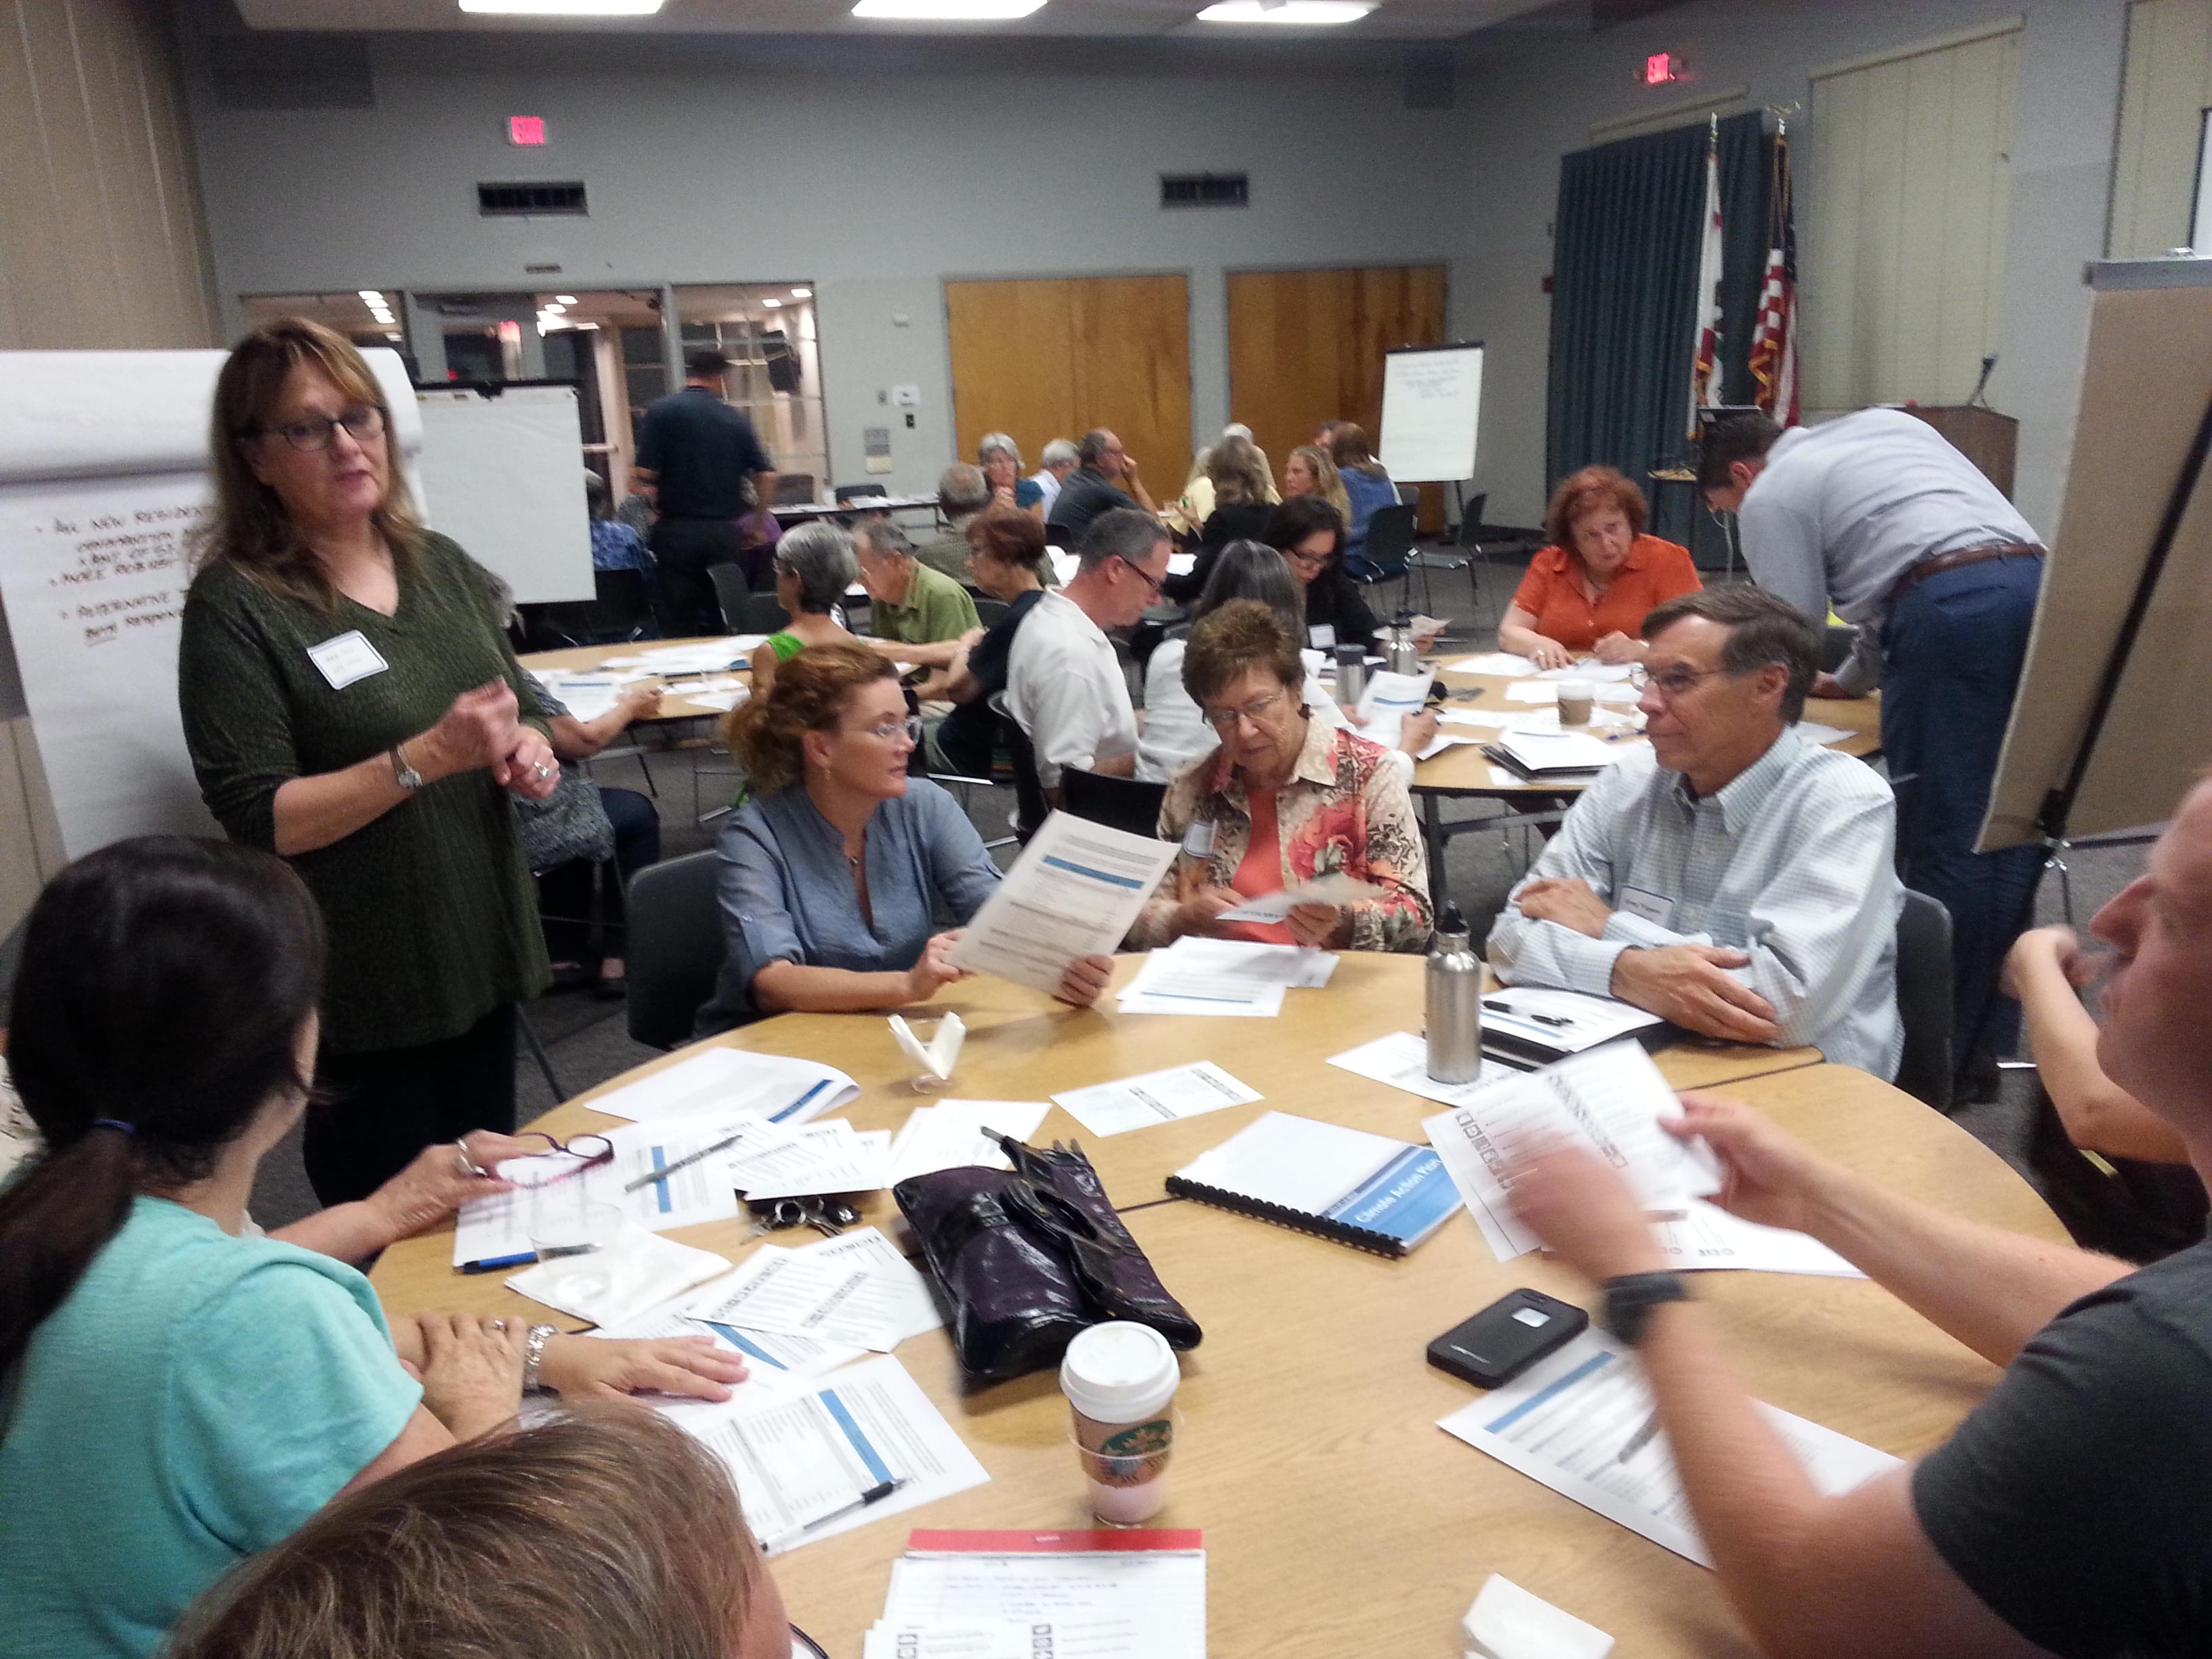 Escondido Climate Action Plan Workshop @ Escondido City Hall, Mitchell Room | Escondido | California